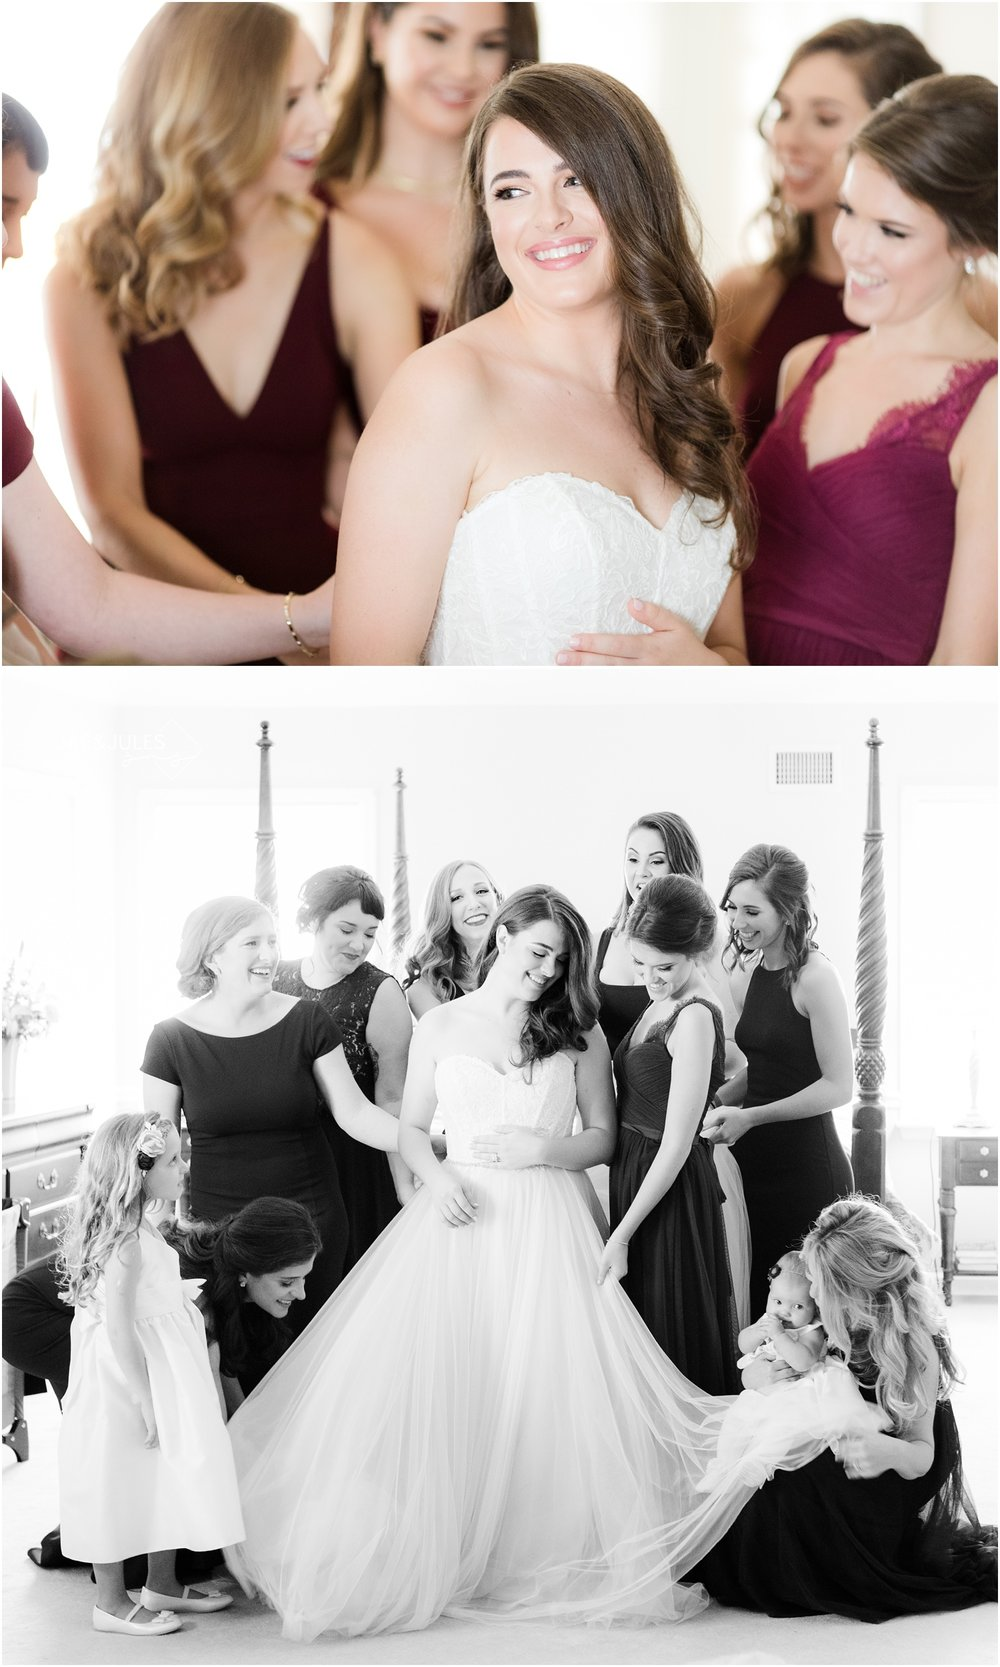 Bridesmaids helping bride get dressed at home in Manasquan, NJ.